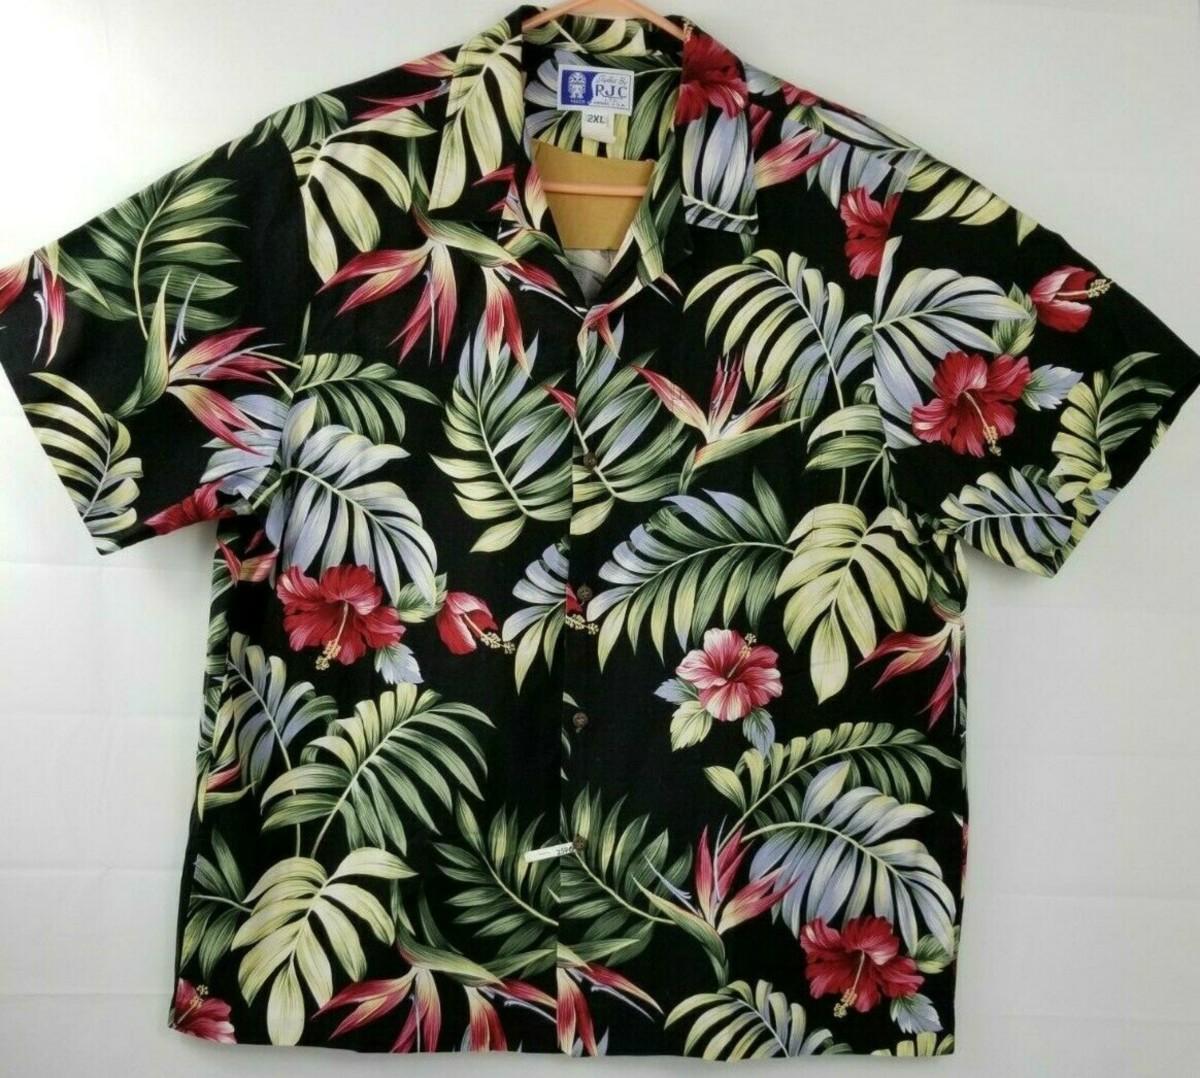 RJC LTD Mens Hawaiian Short Sleeve Shirt 2XL Made in USA/Hawaii EUC Button Down Multi-color …